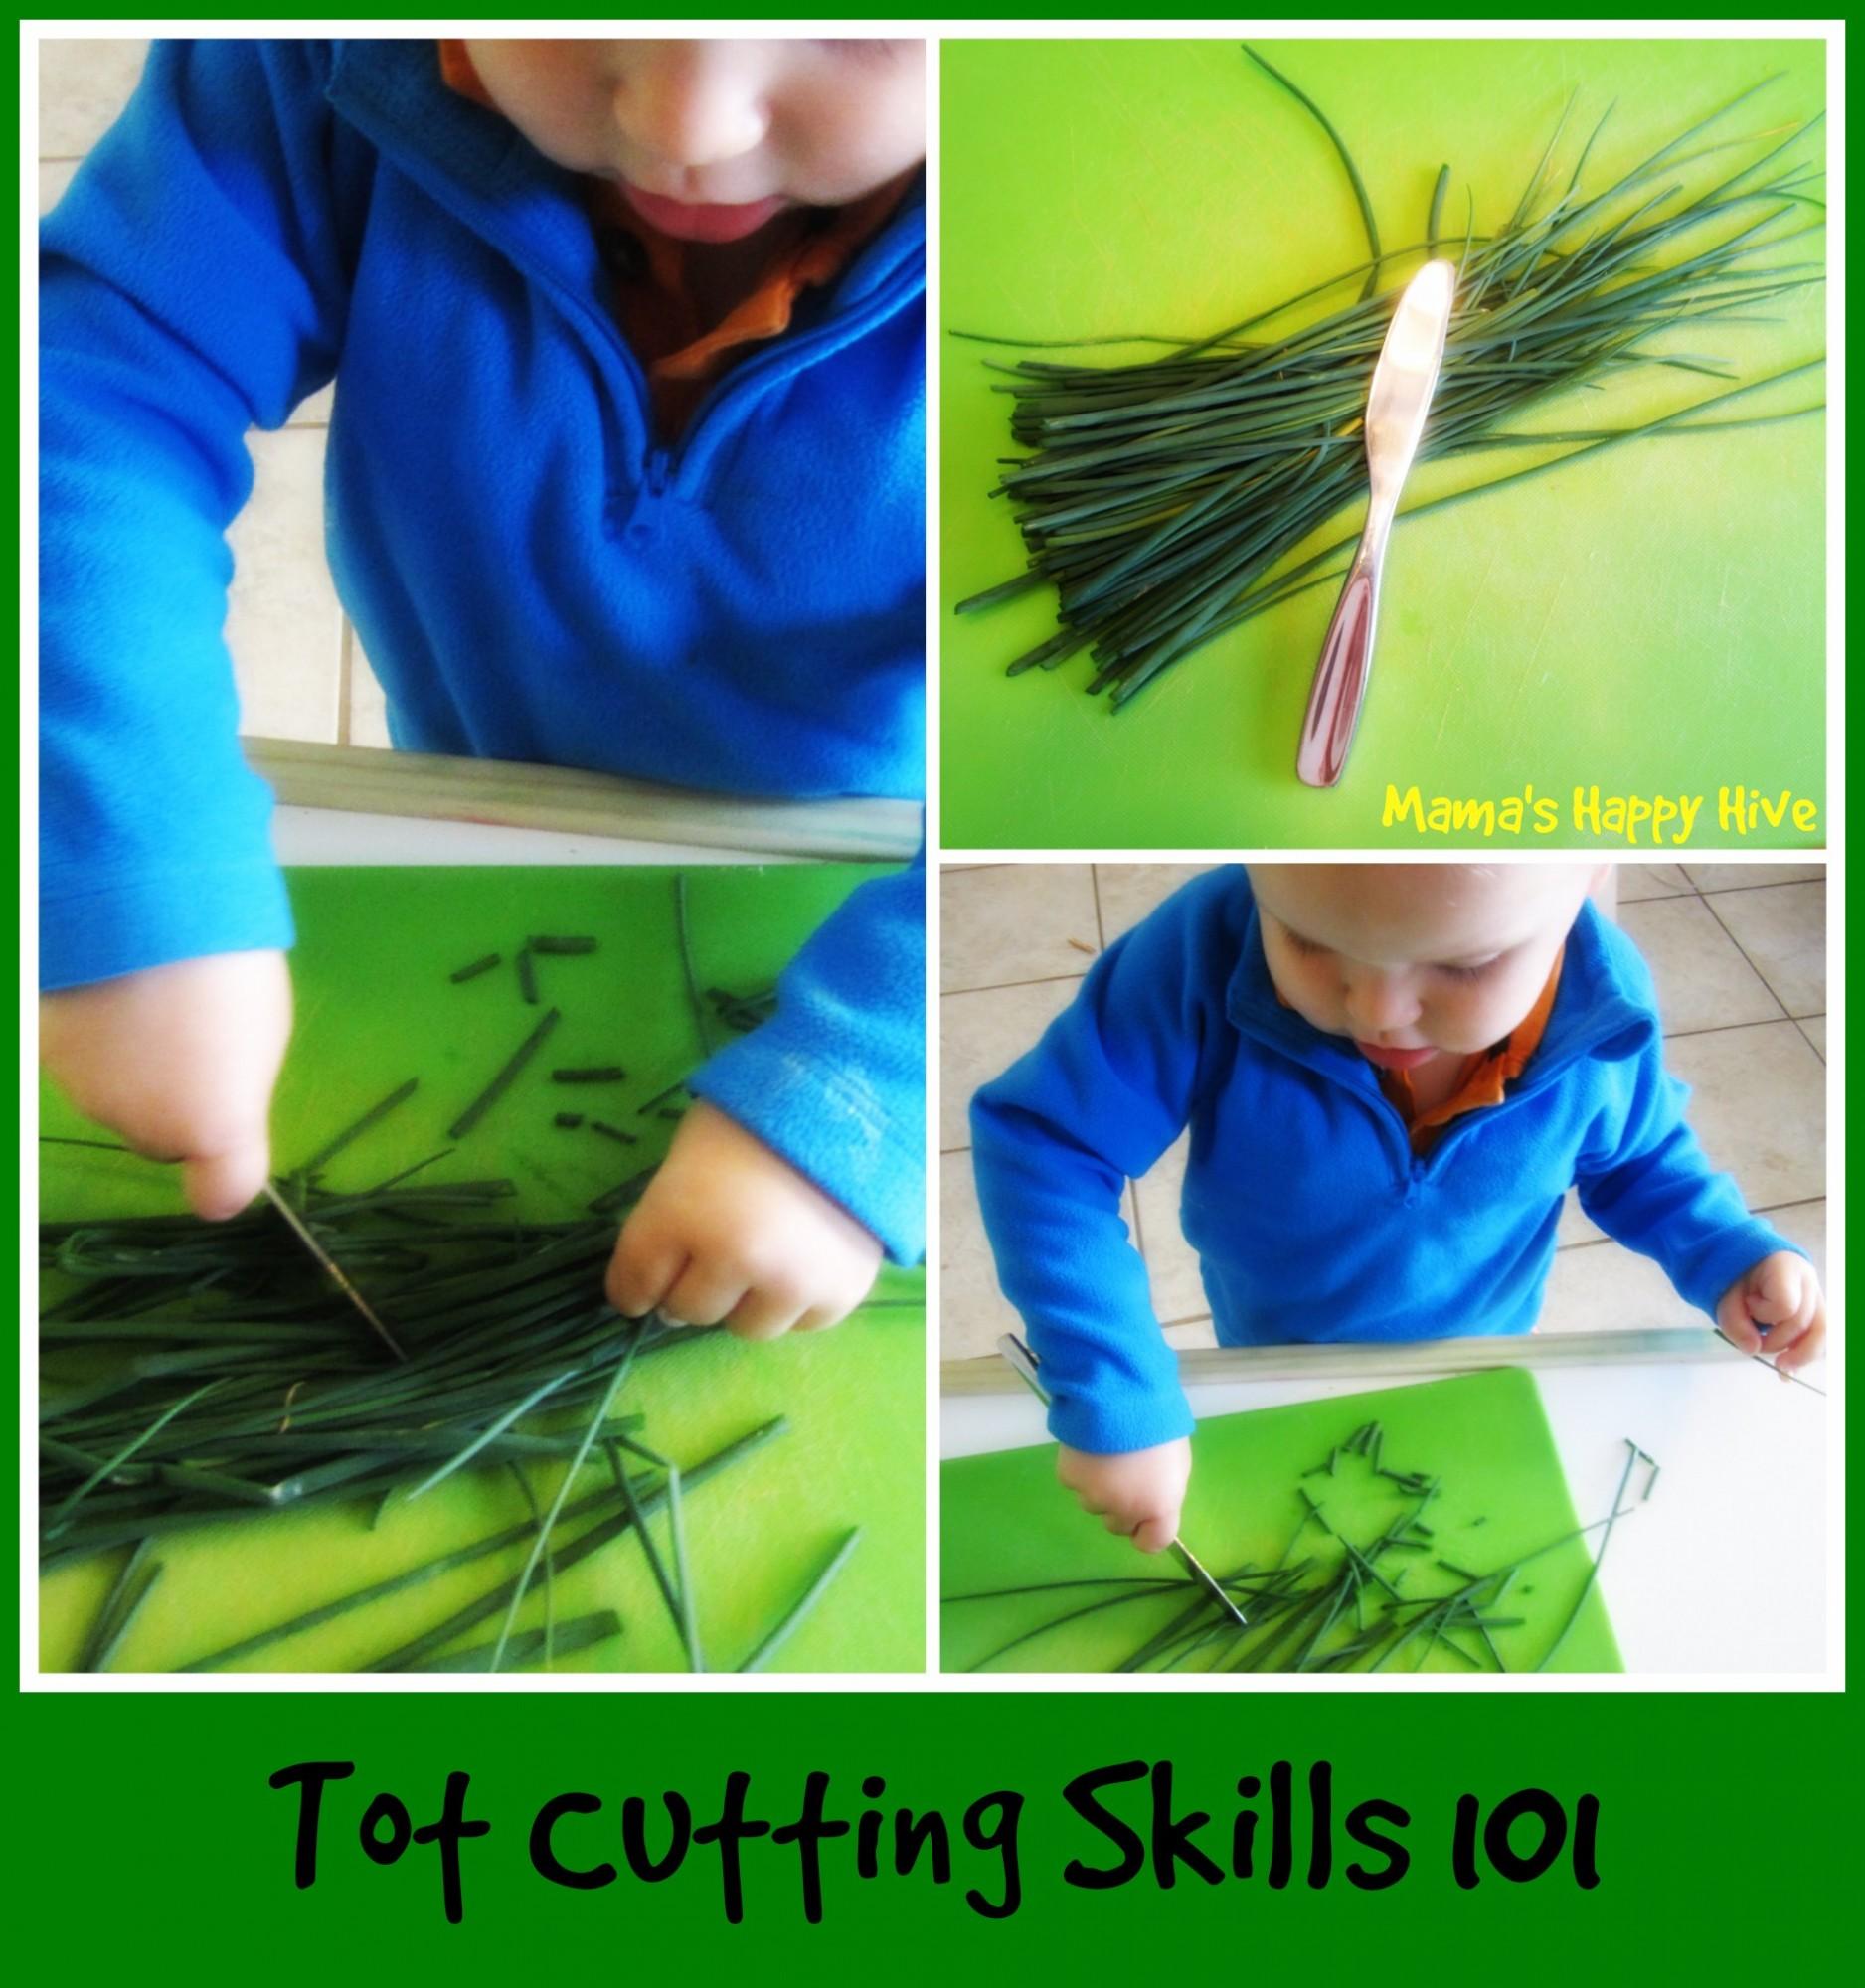 Toddler Cutting Skills - www.mamashappyhive.com